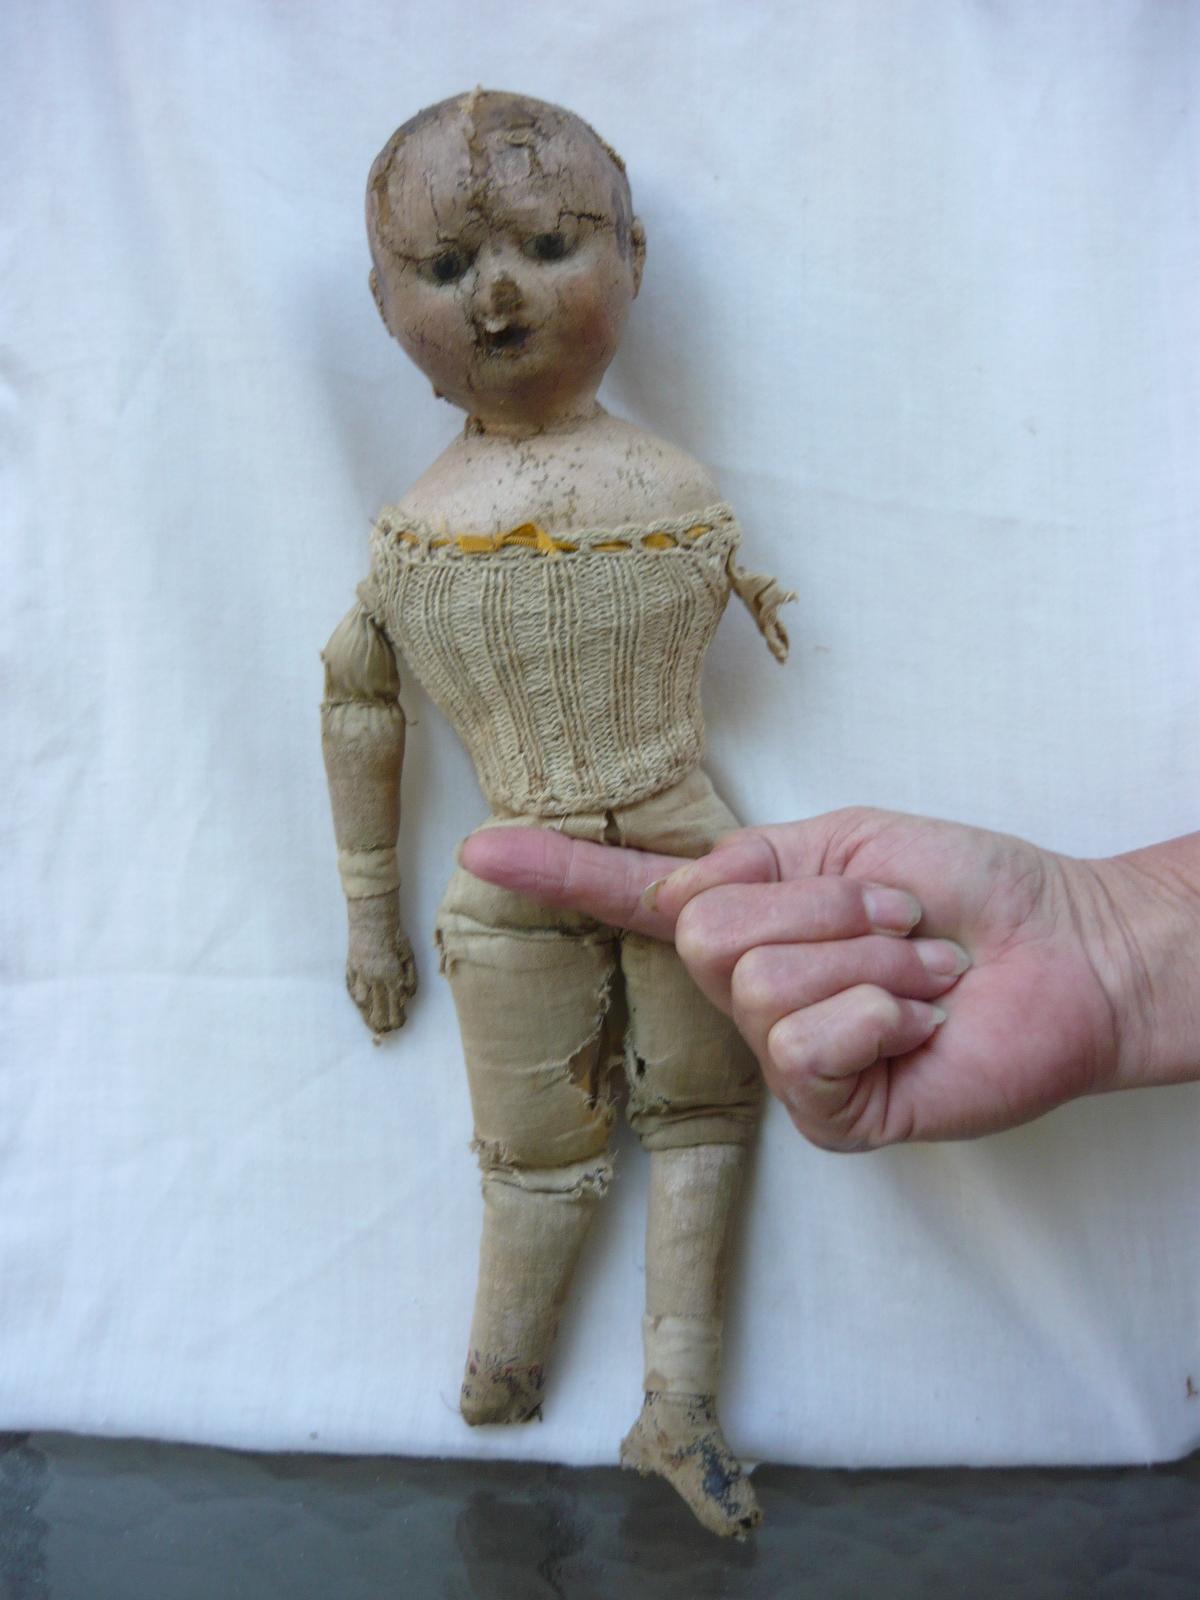 izannah walker chronicles izannah walker doll body designs rh izannahwalkerchronicles com izannah walker doll pattern izannah walker doll ebay